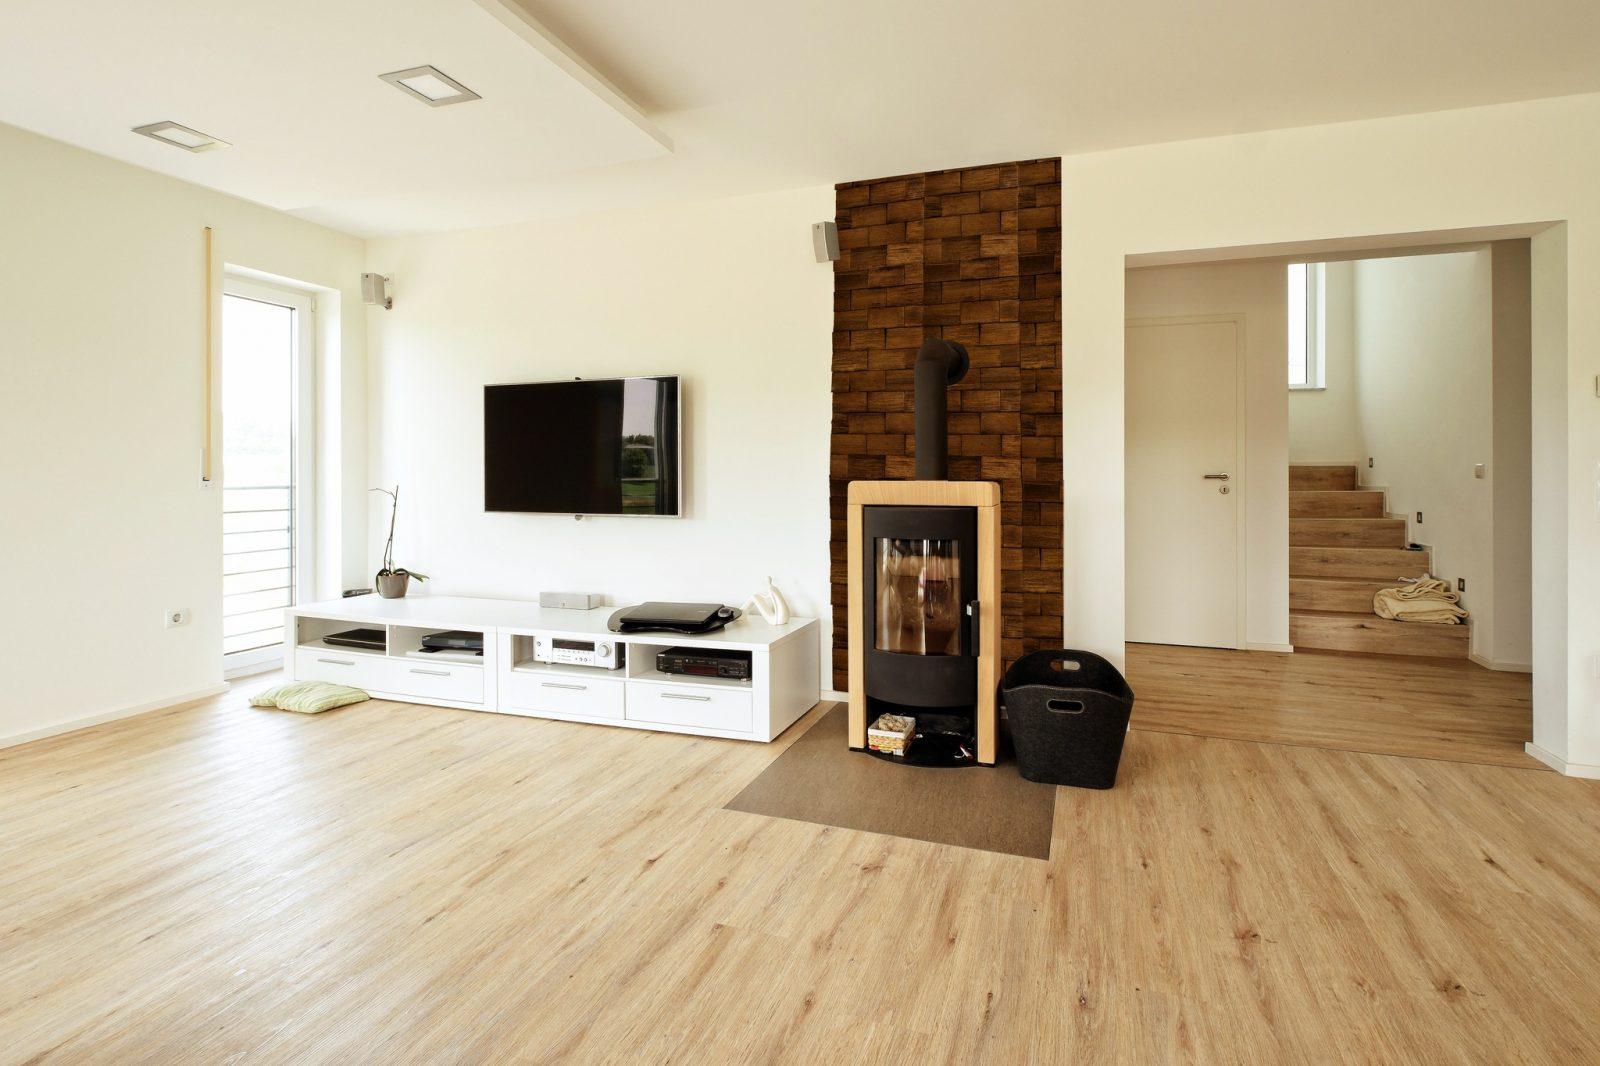 Holz Wandverkleidung, Deckenpaneele